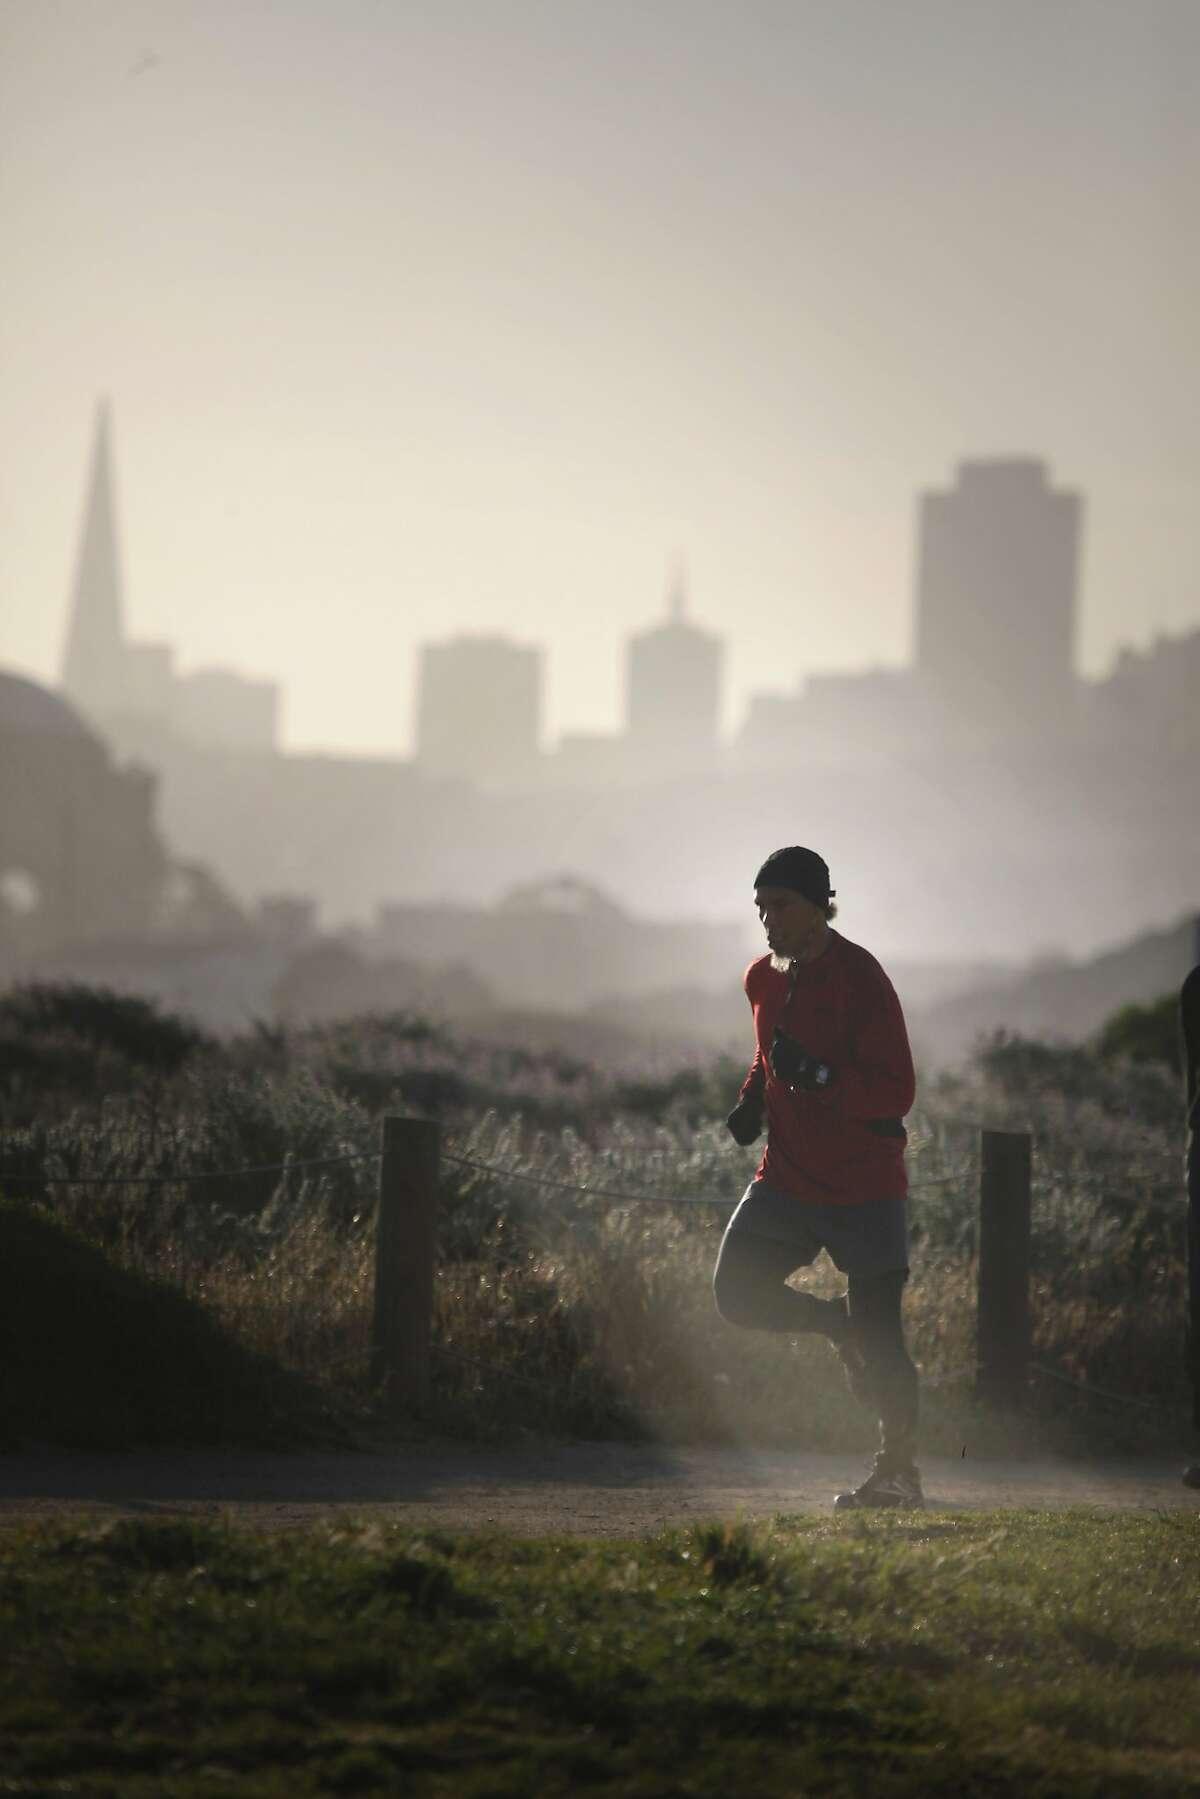 Ronnie Goodman runs at Crissy Field during his morning run on Friday, April 18, 2014, in San Francisco, Calif.